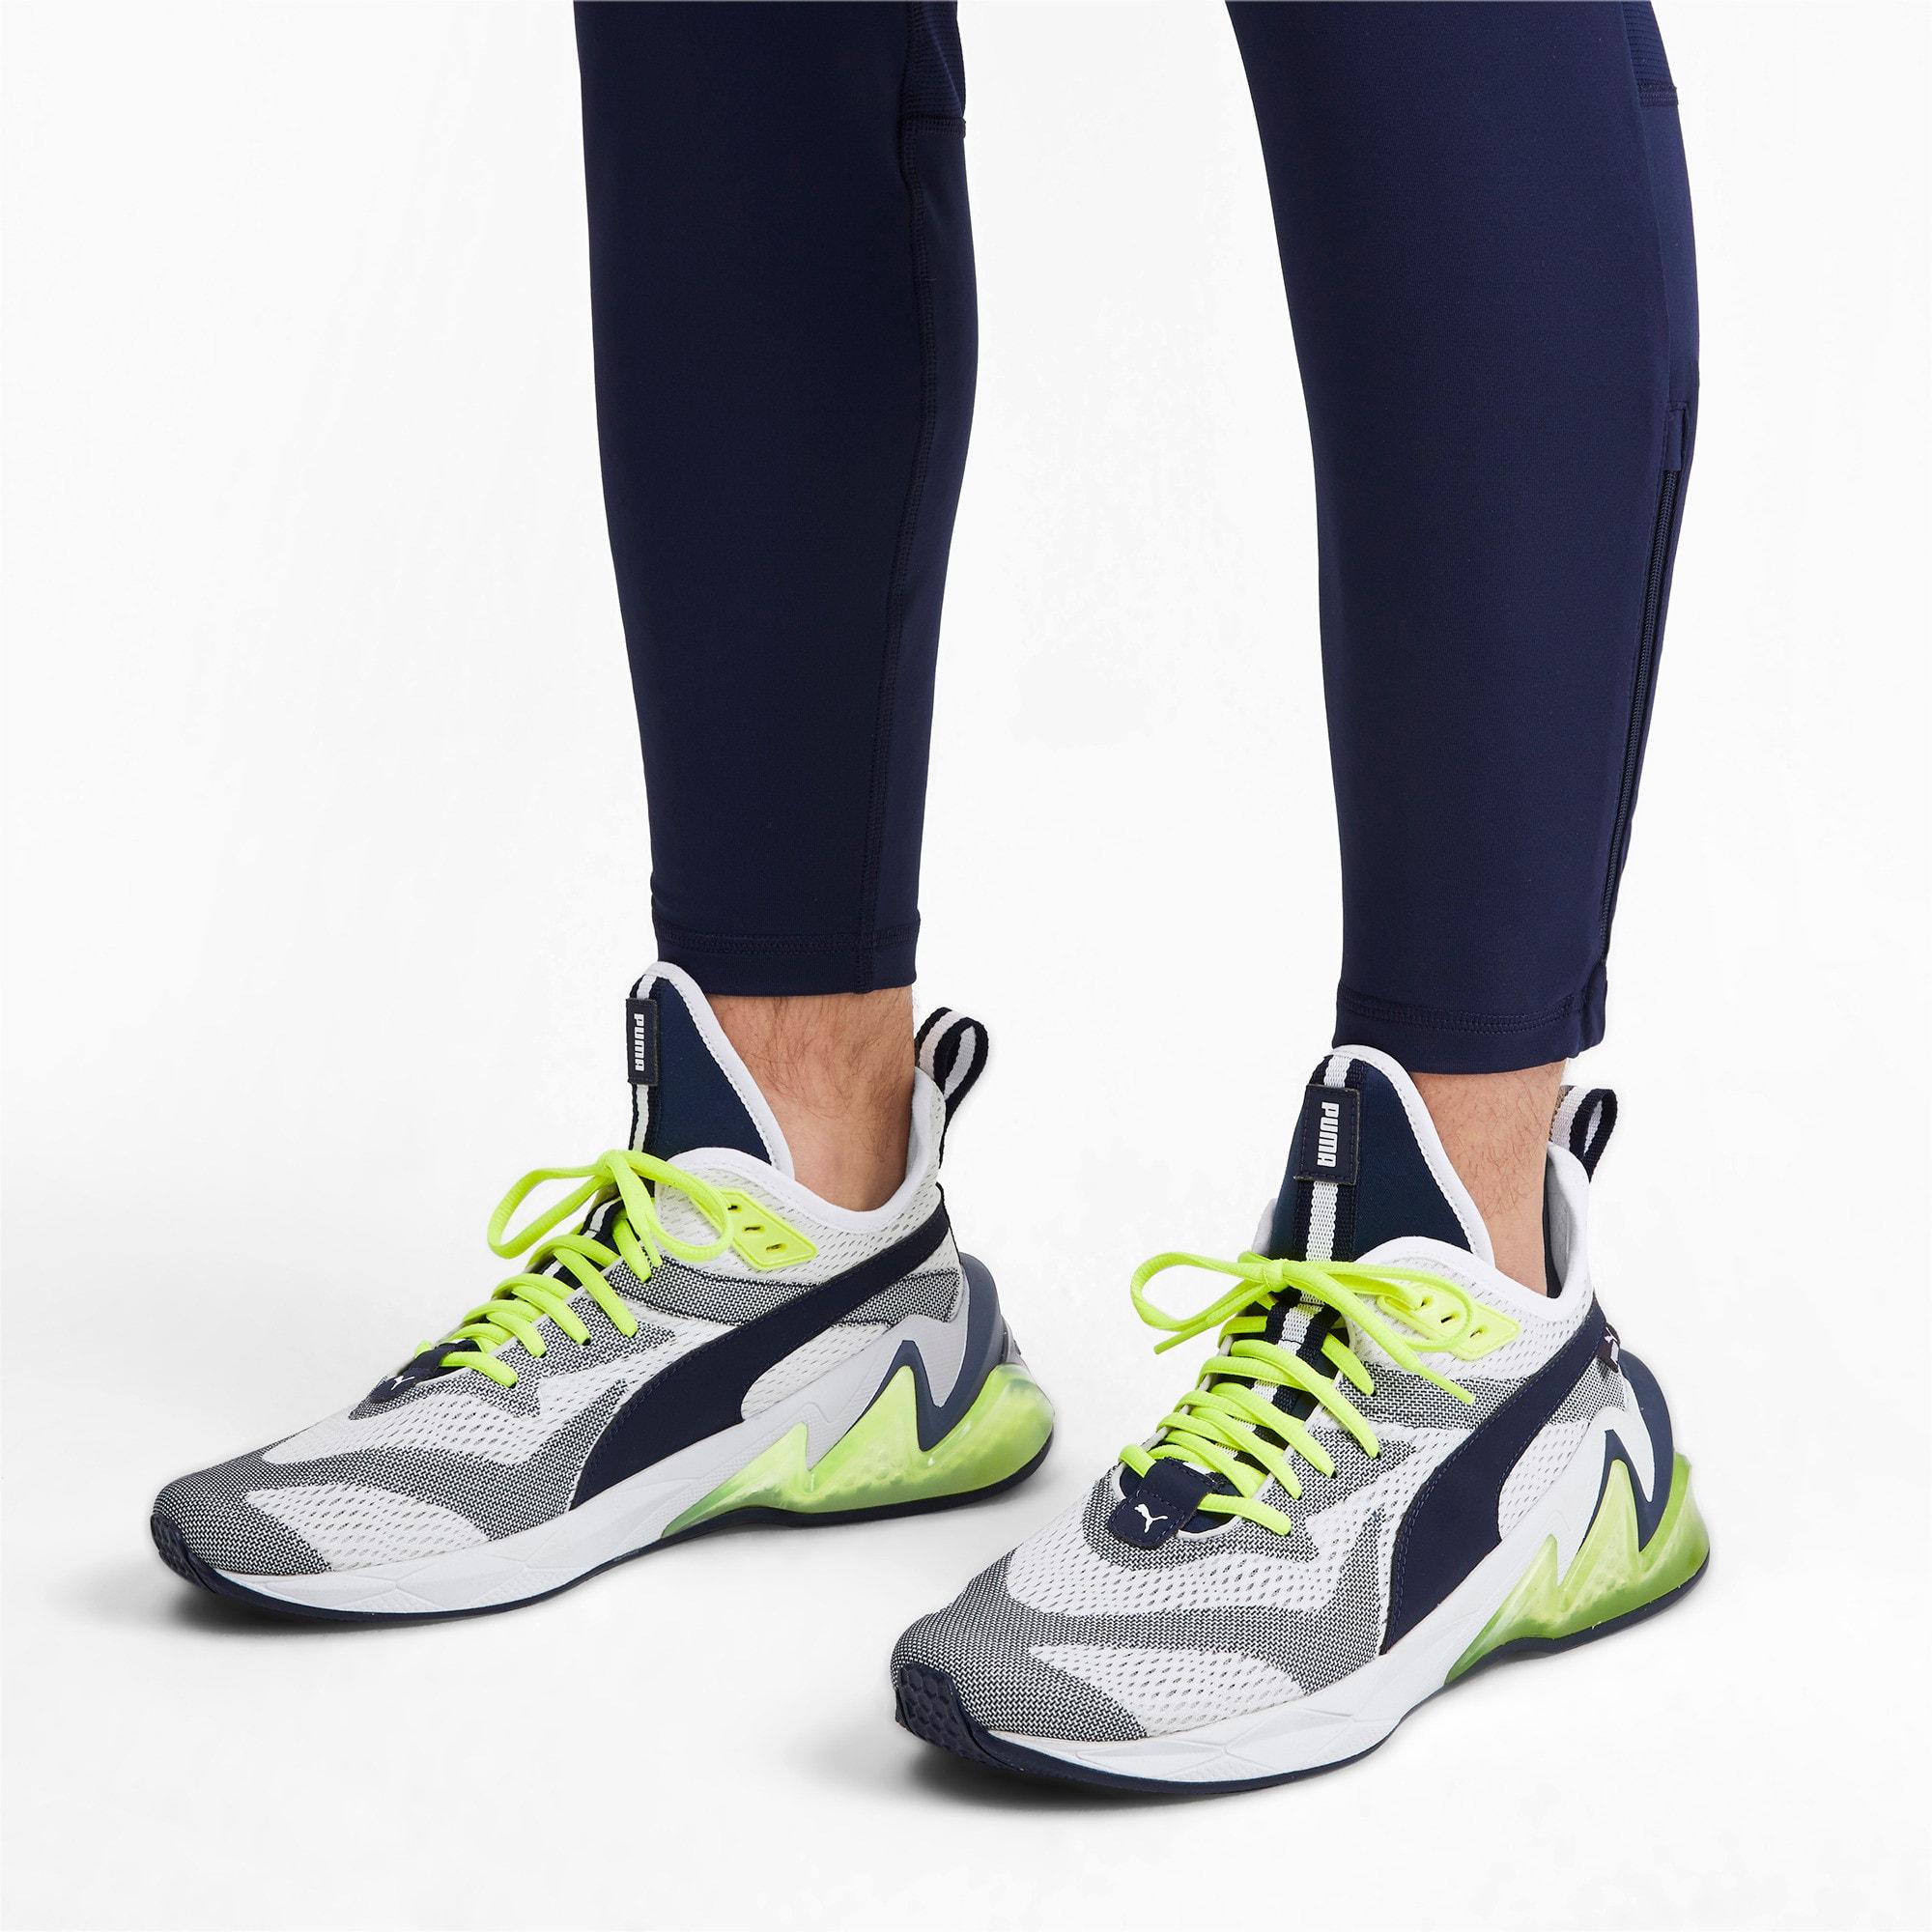 Thumbnail 2 of LQDCELL Origin Tech Men's Shoes, Puma White-Peacoat, medium